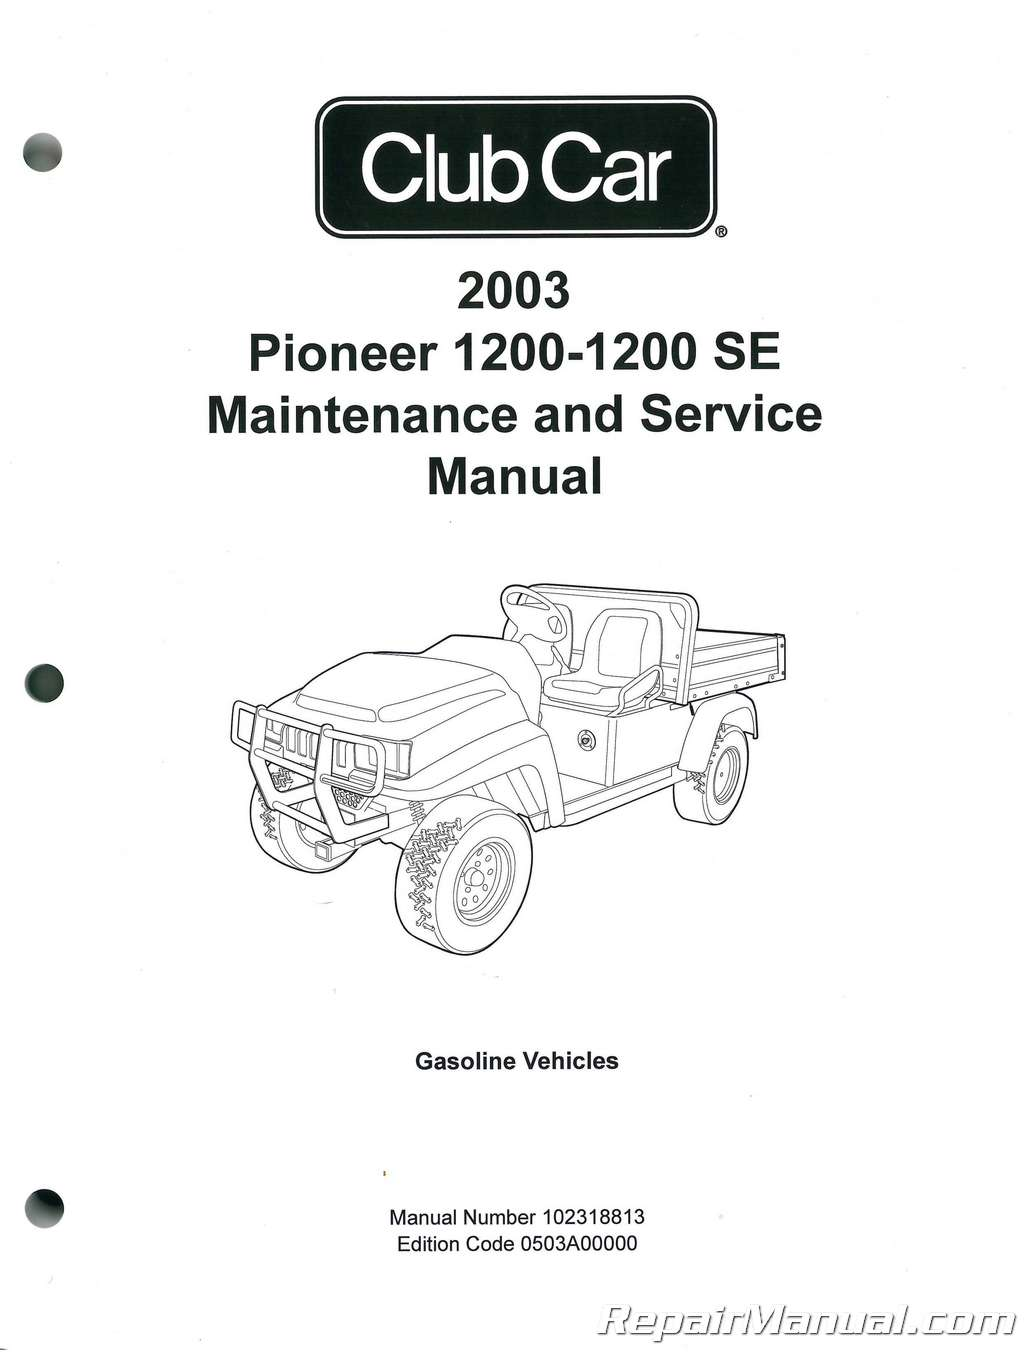 Club Car Pioneer Se Service Maintenance Manual